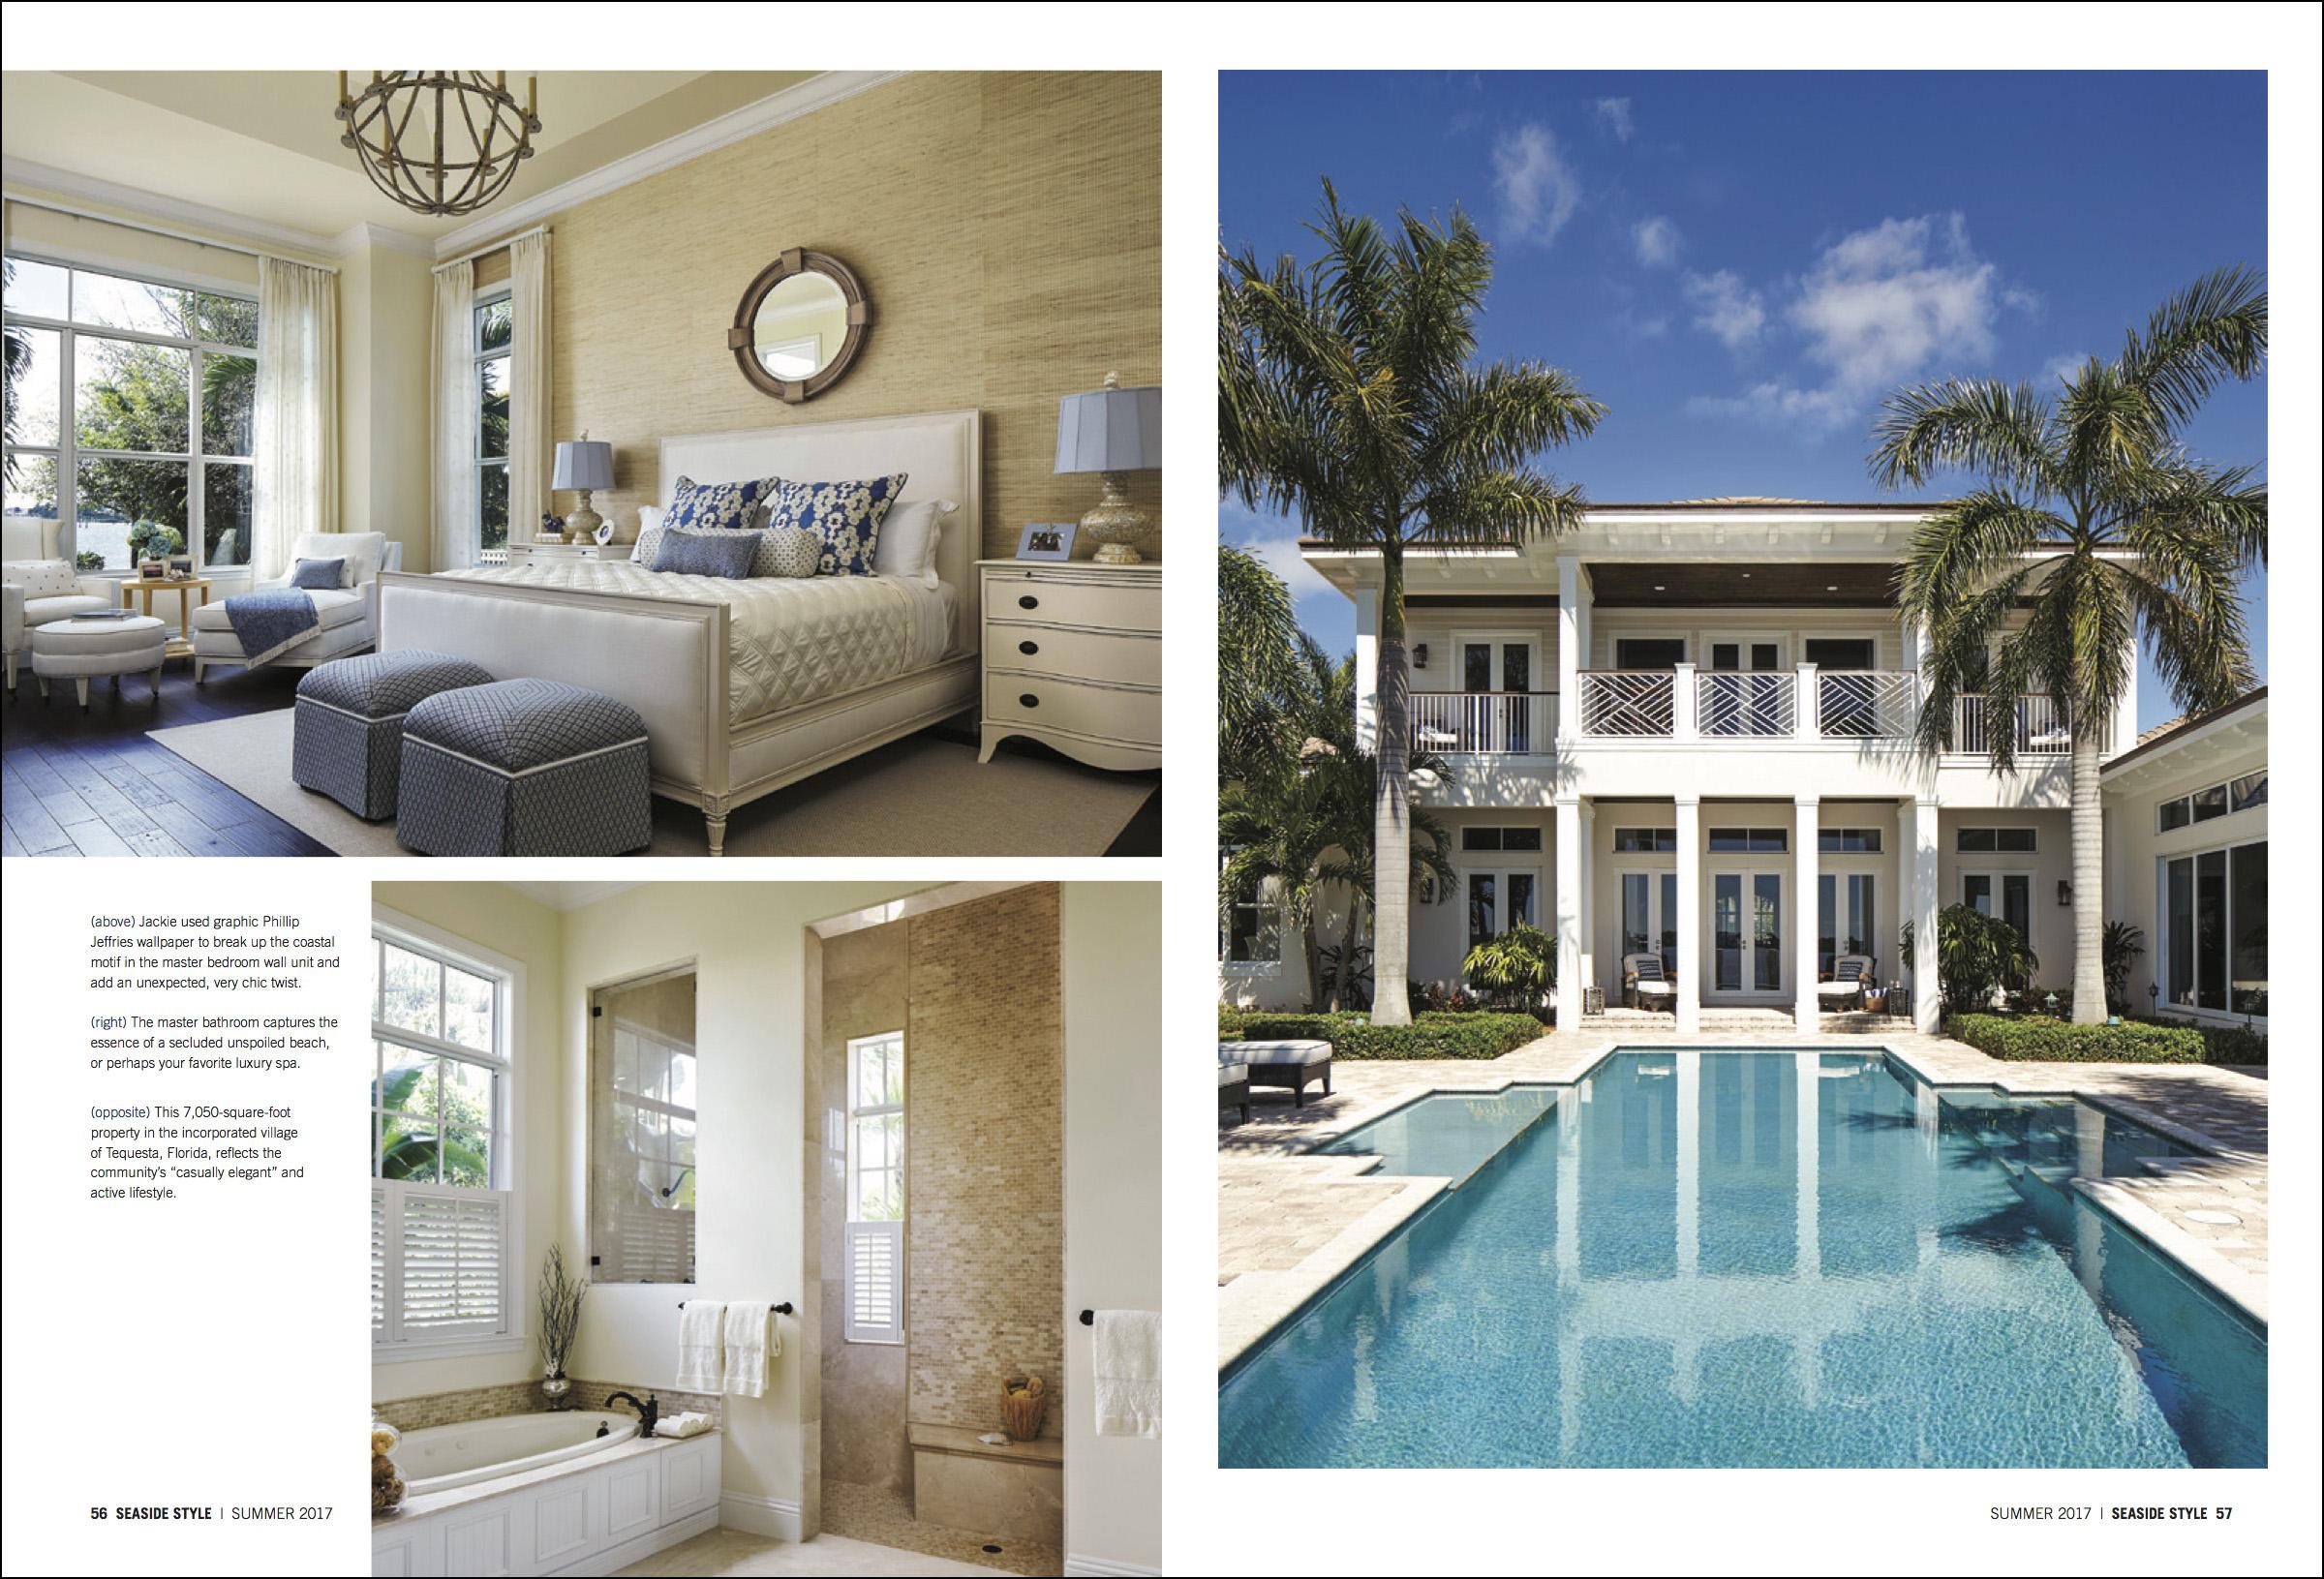 seaside style interior design magazine tequesta palm beach county fl